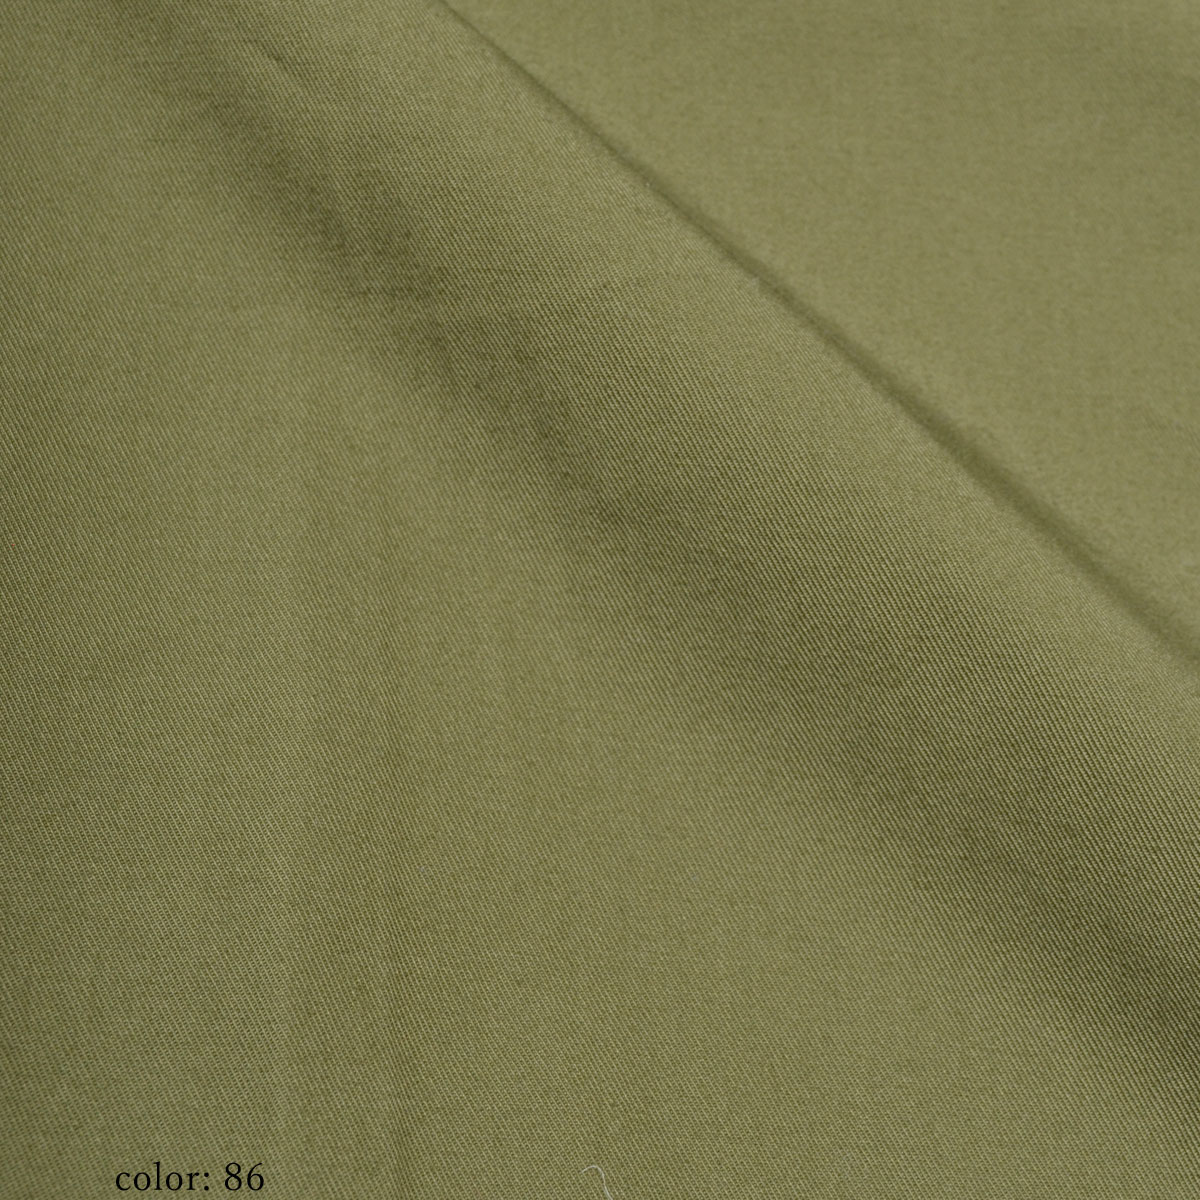 【SALE】Sweet Camel コンパクトギャバ ミリタリーワイド CA6364